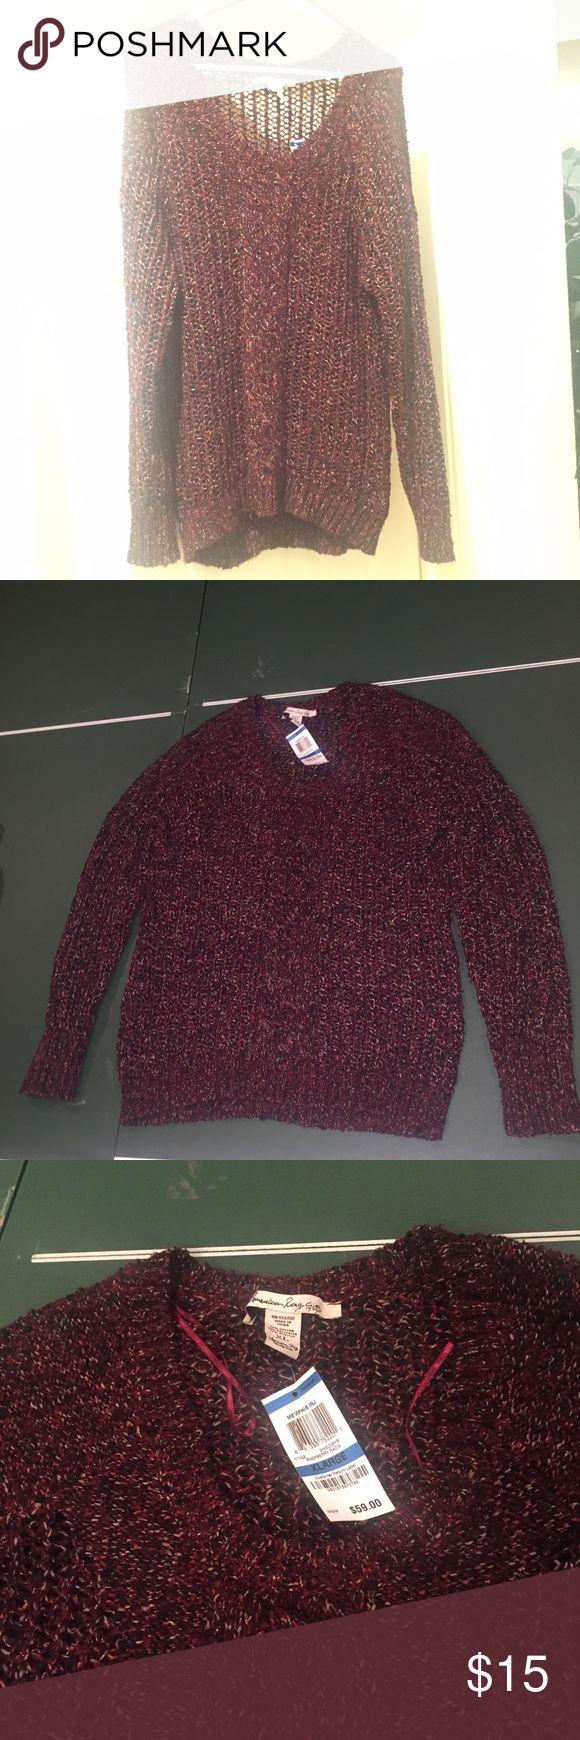 American rag burgundy sweater size XL American rag burgundy sweater size XL new with tag on American Rag Sweaters Crew & Scoop Necks